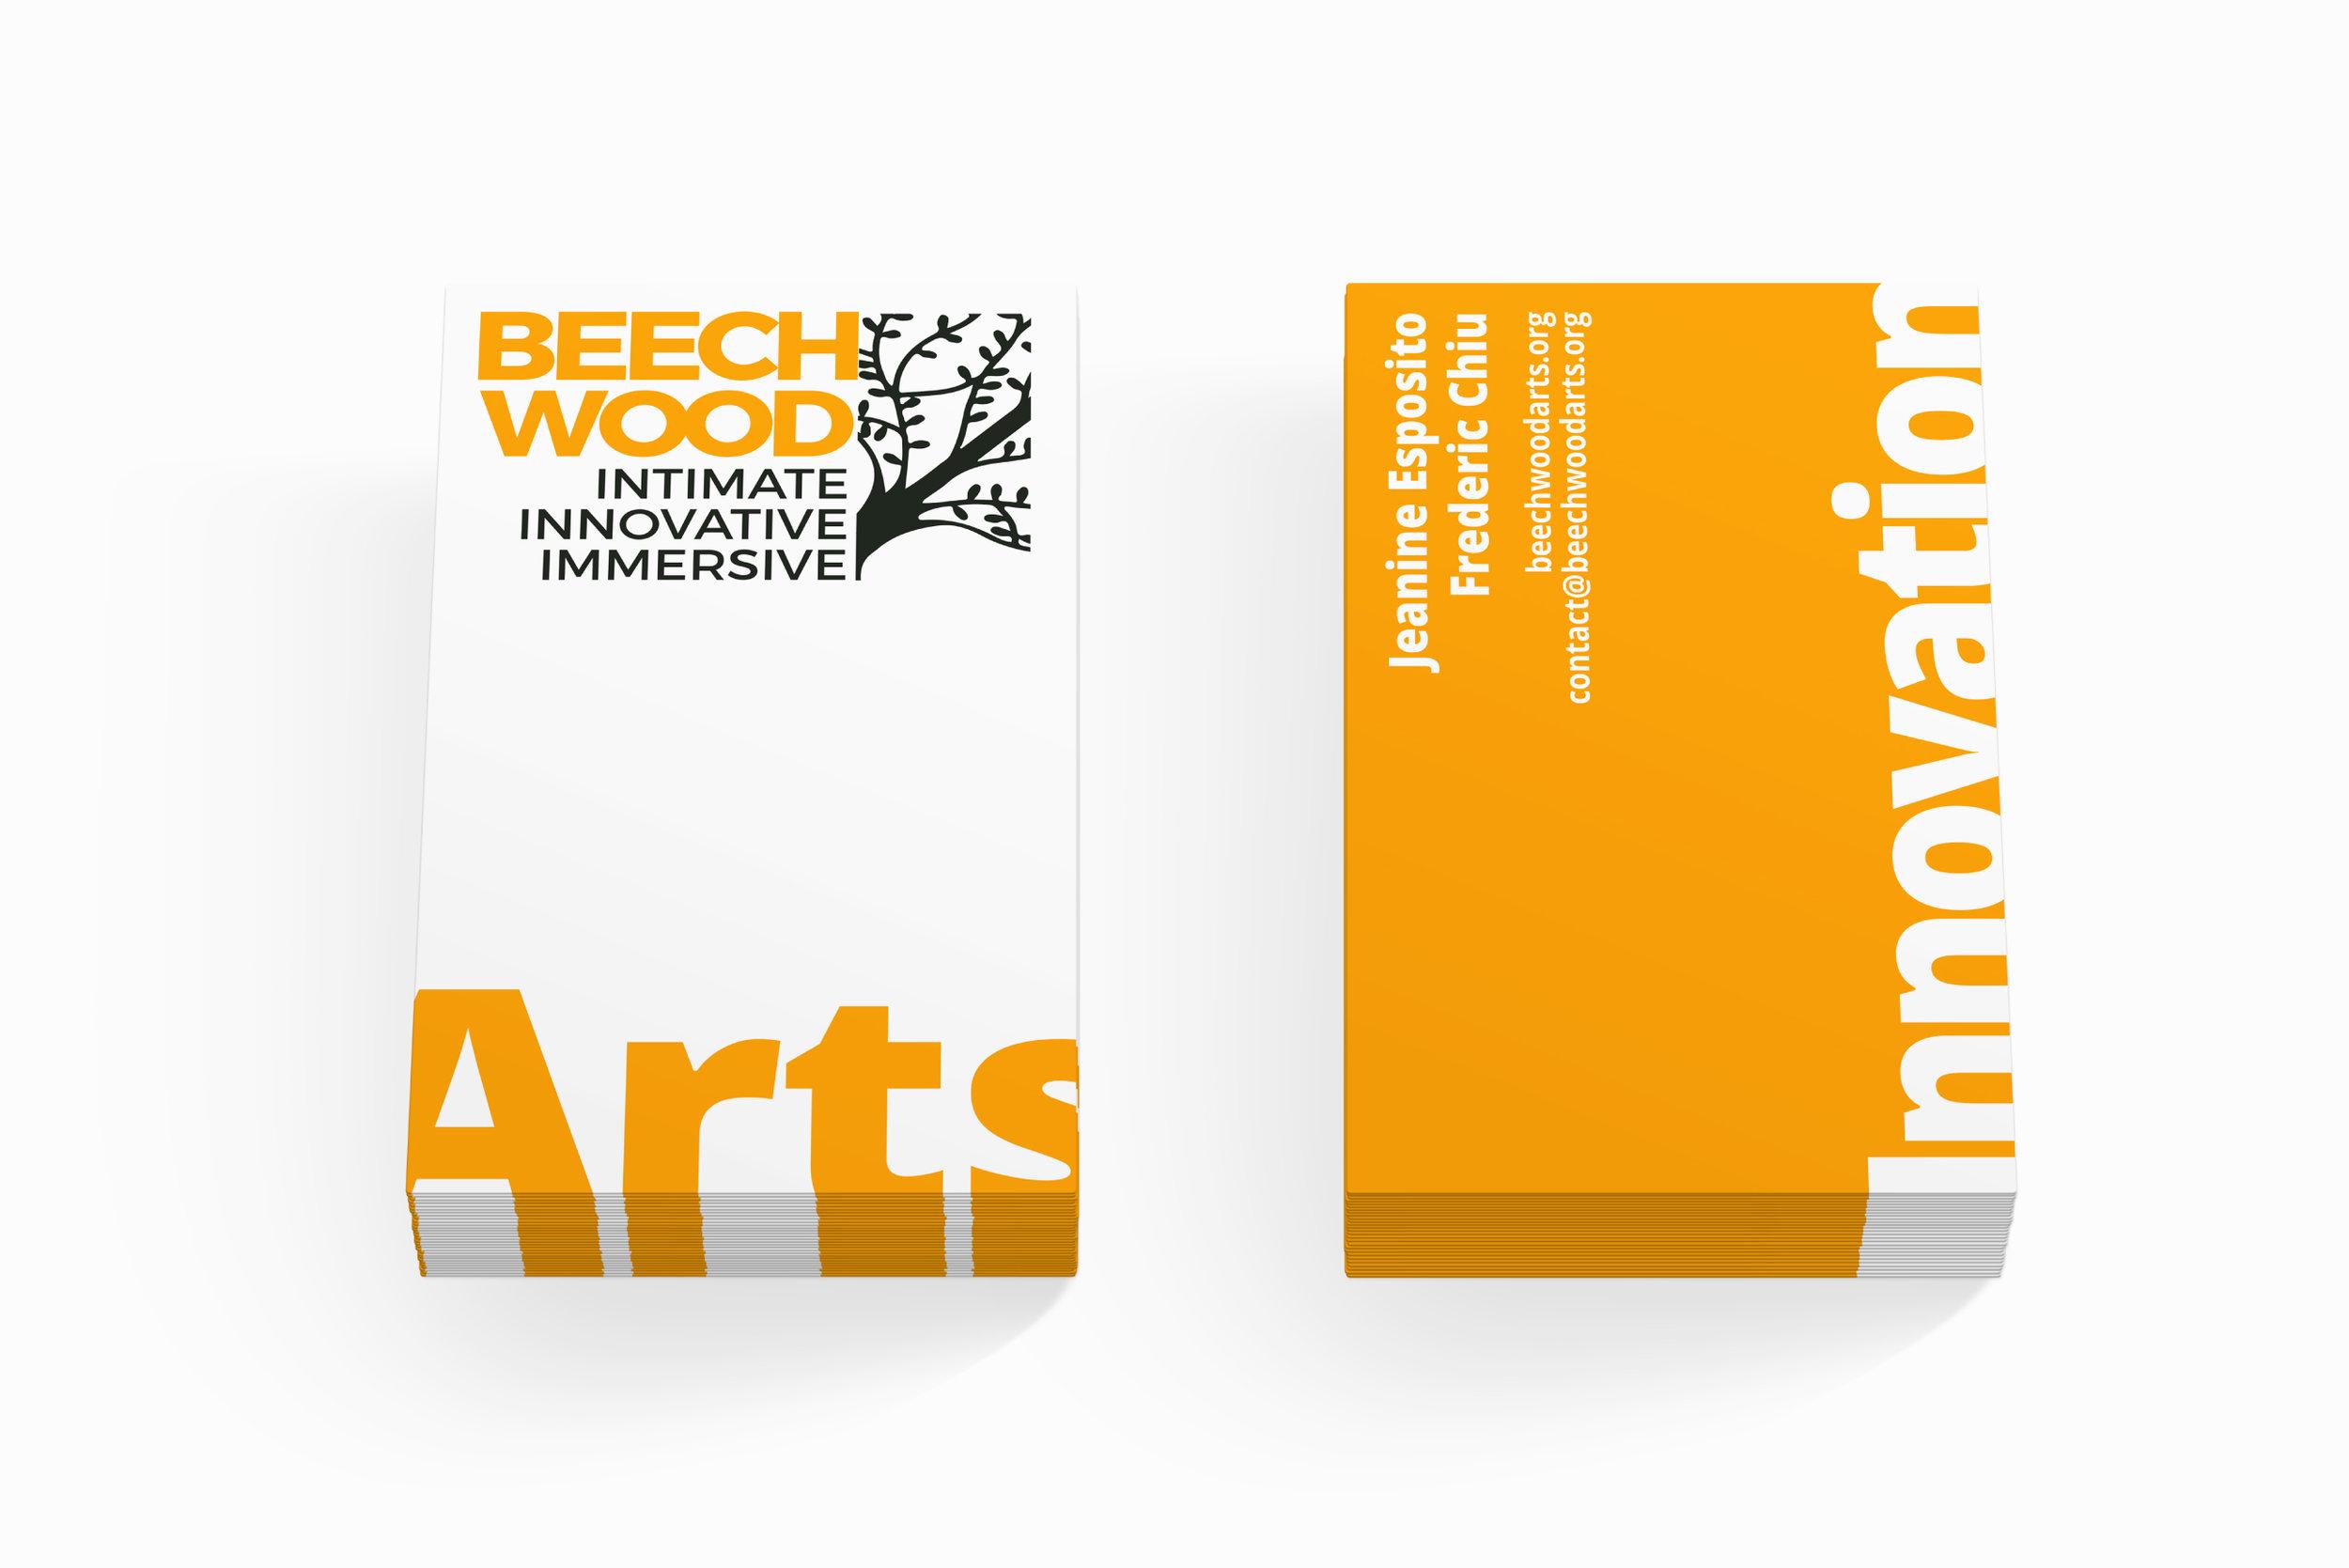 beechwood layout for web card big-02.jpg